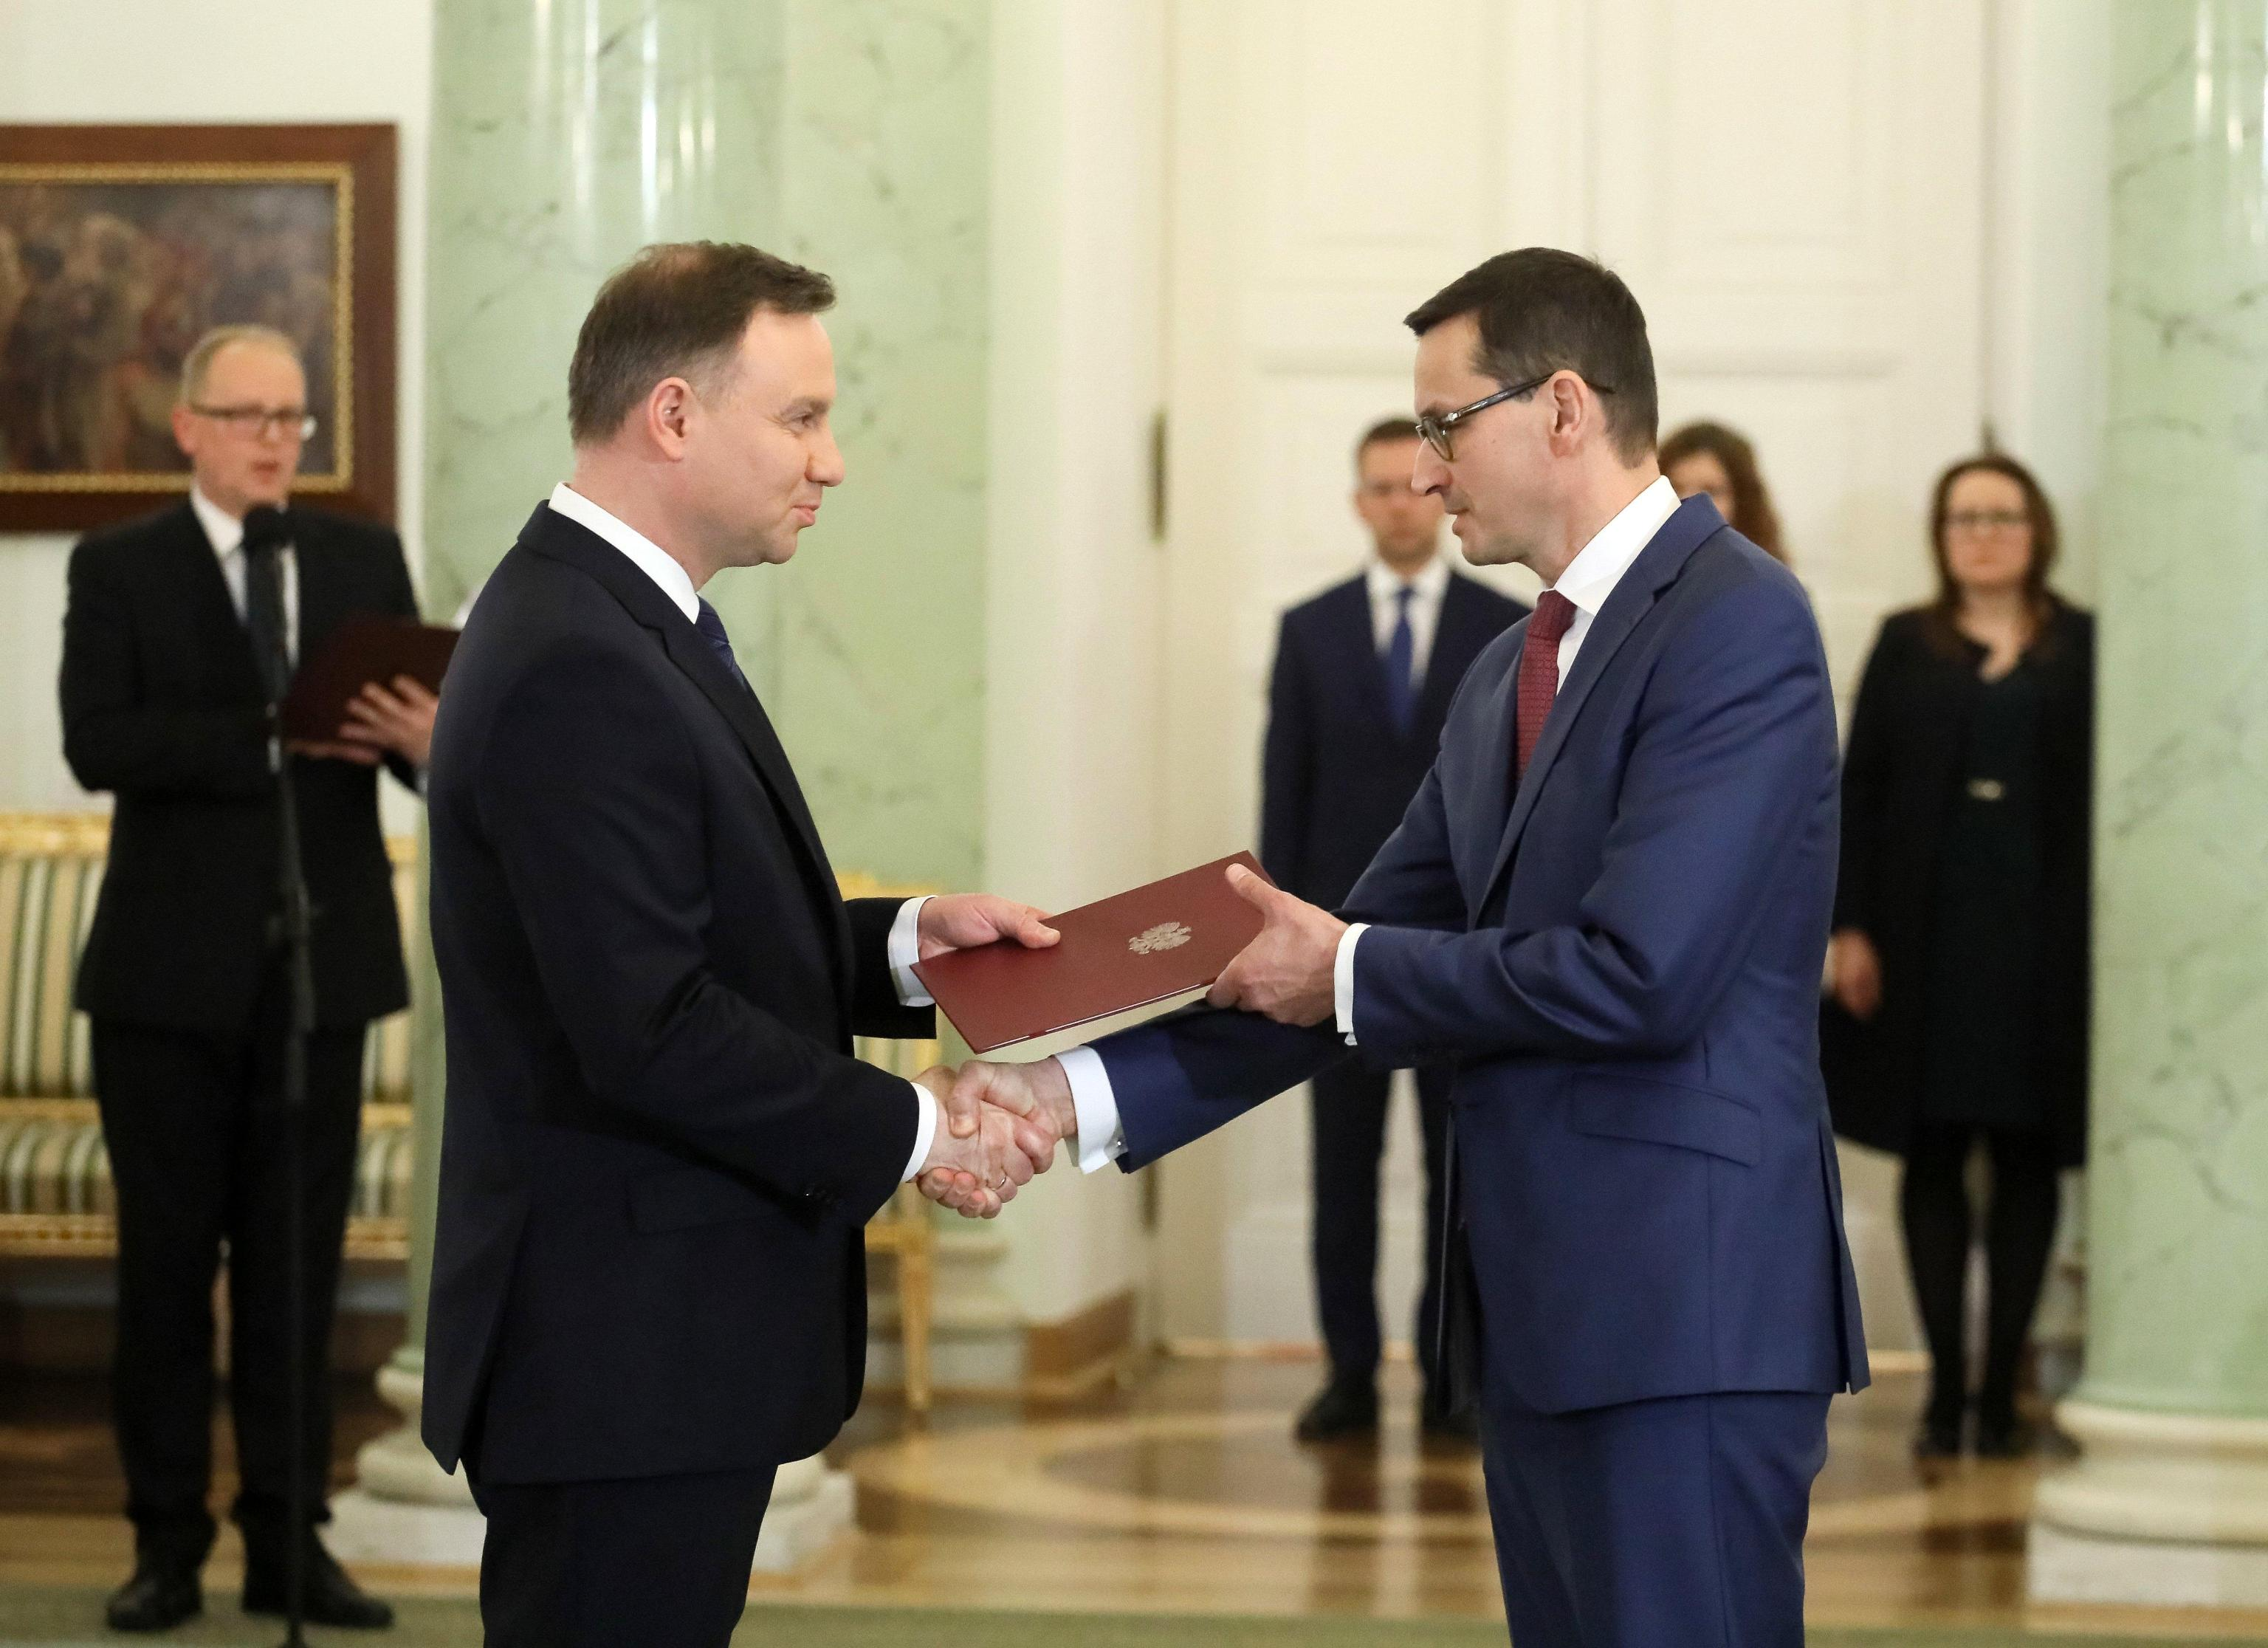 Polonia: nuovo premier è Morawiecki